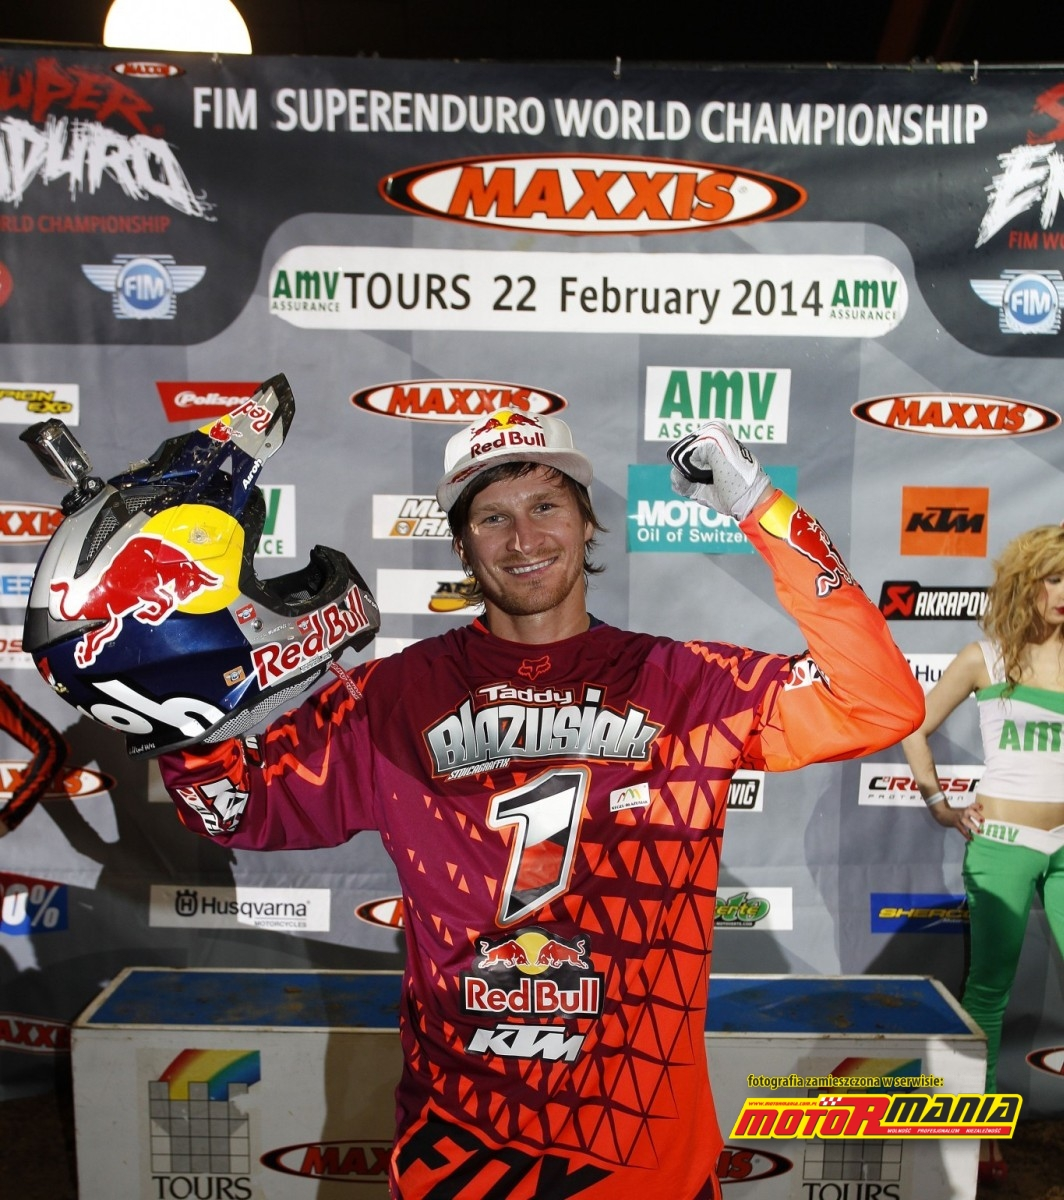 Tadek Blazusiak mistrzem SuperEnduro 2014 (9) - fot Edmunds J - KTM Images